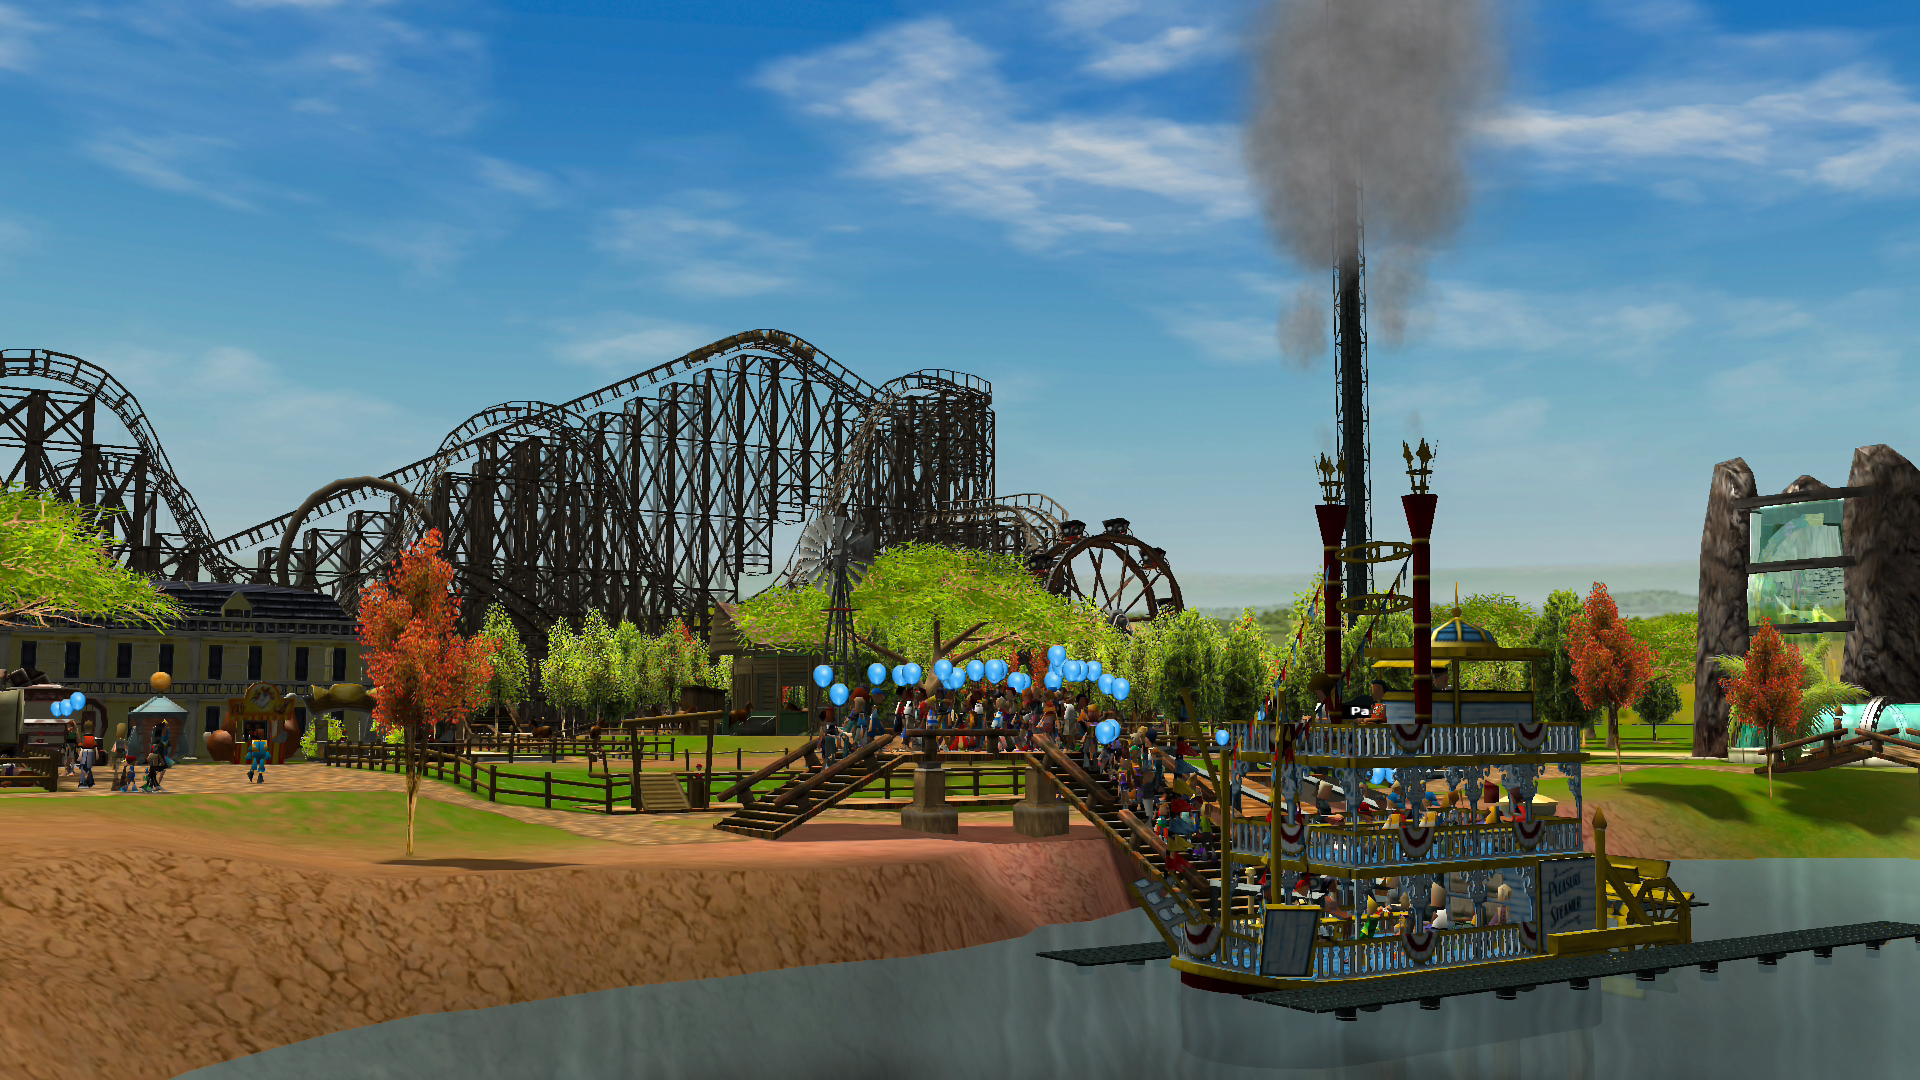 RollerCoaster Tycoon 3: Complete Edition официально анонсирована на Switch